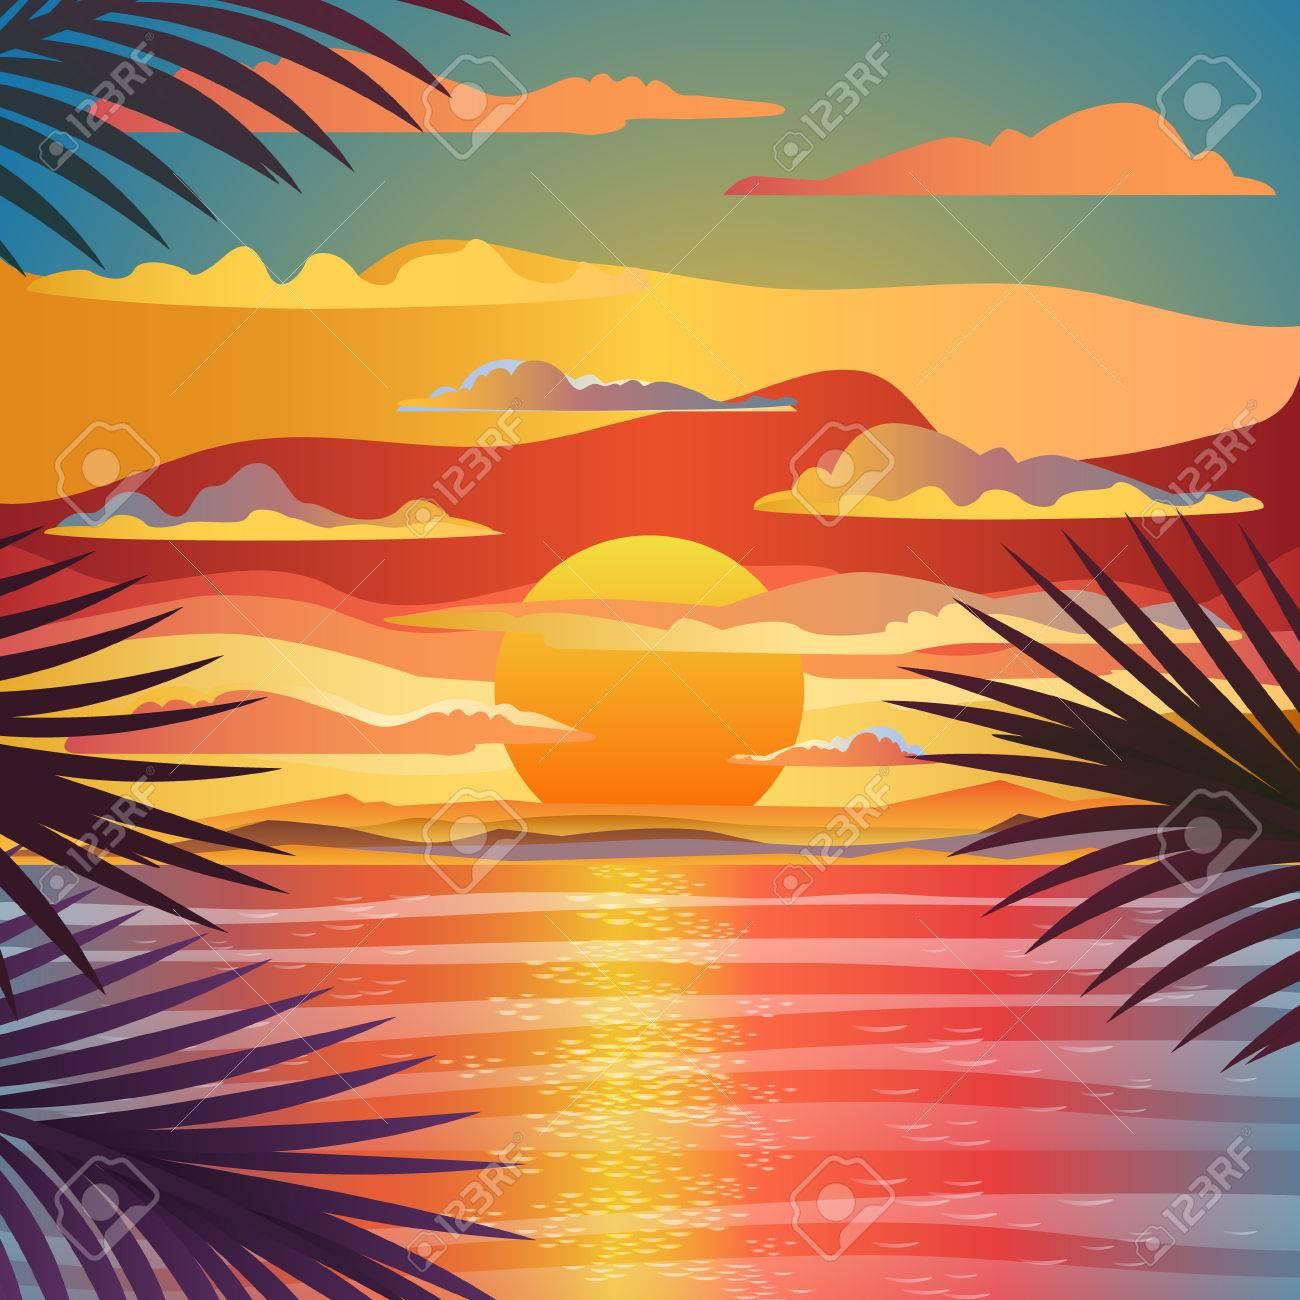 Beautiful Beach Sunset Landscape Flat Design Vector Illustration Stock